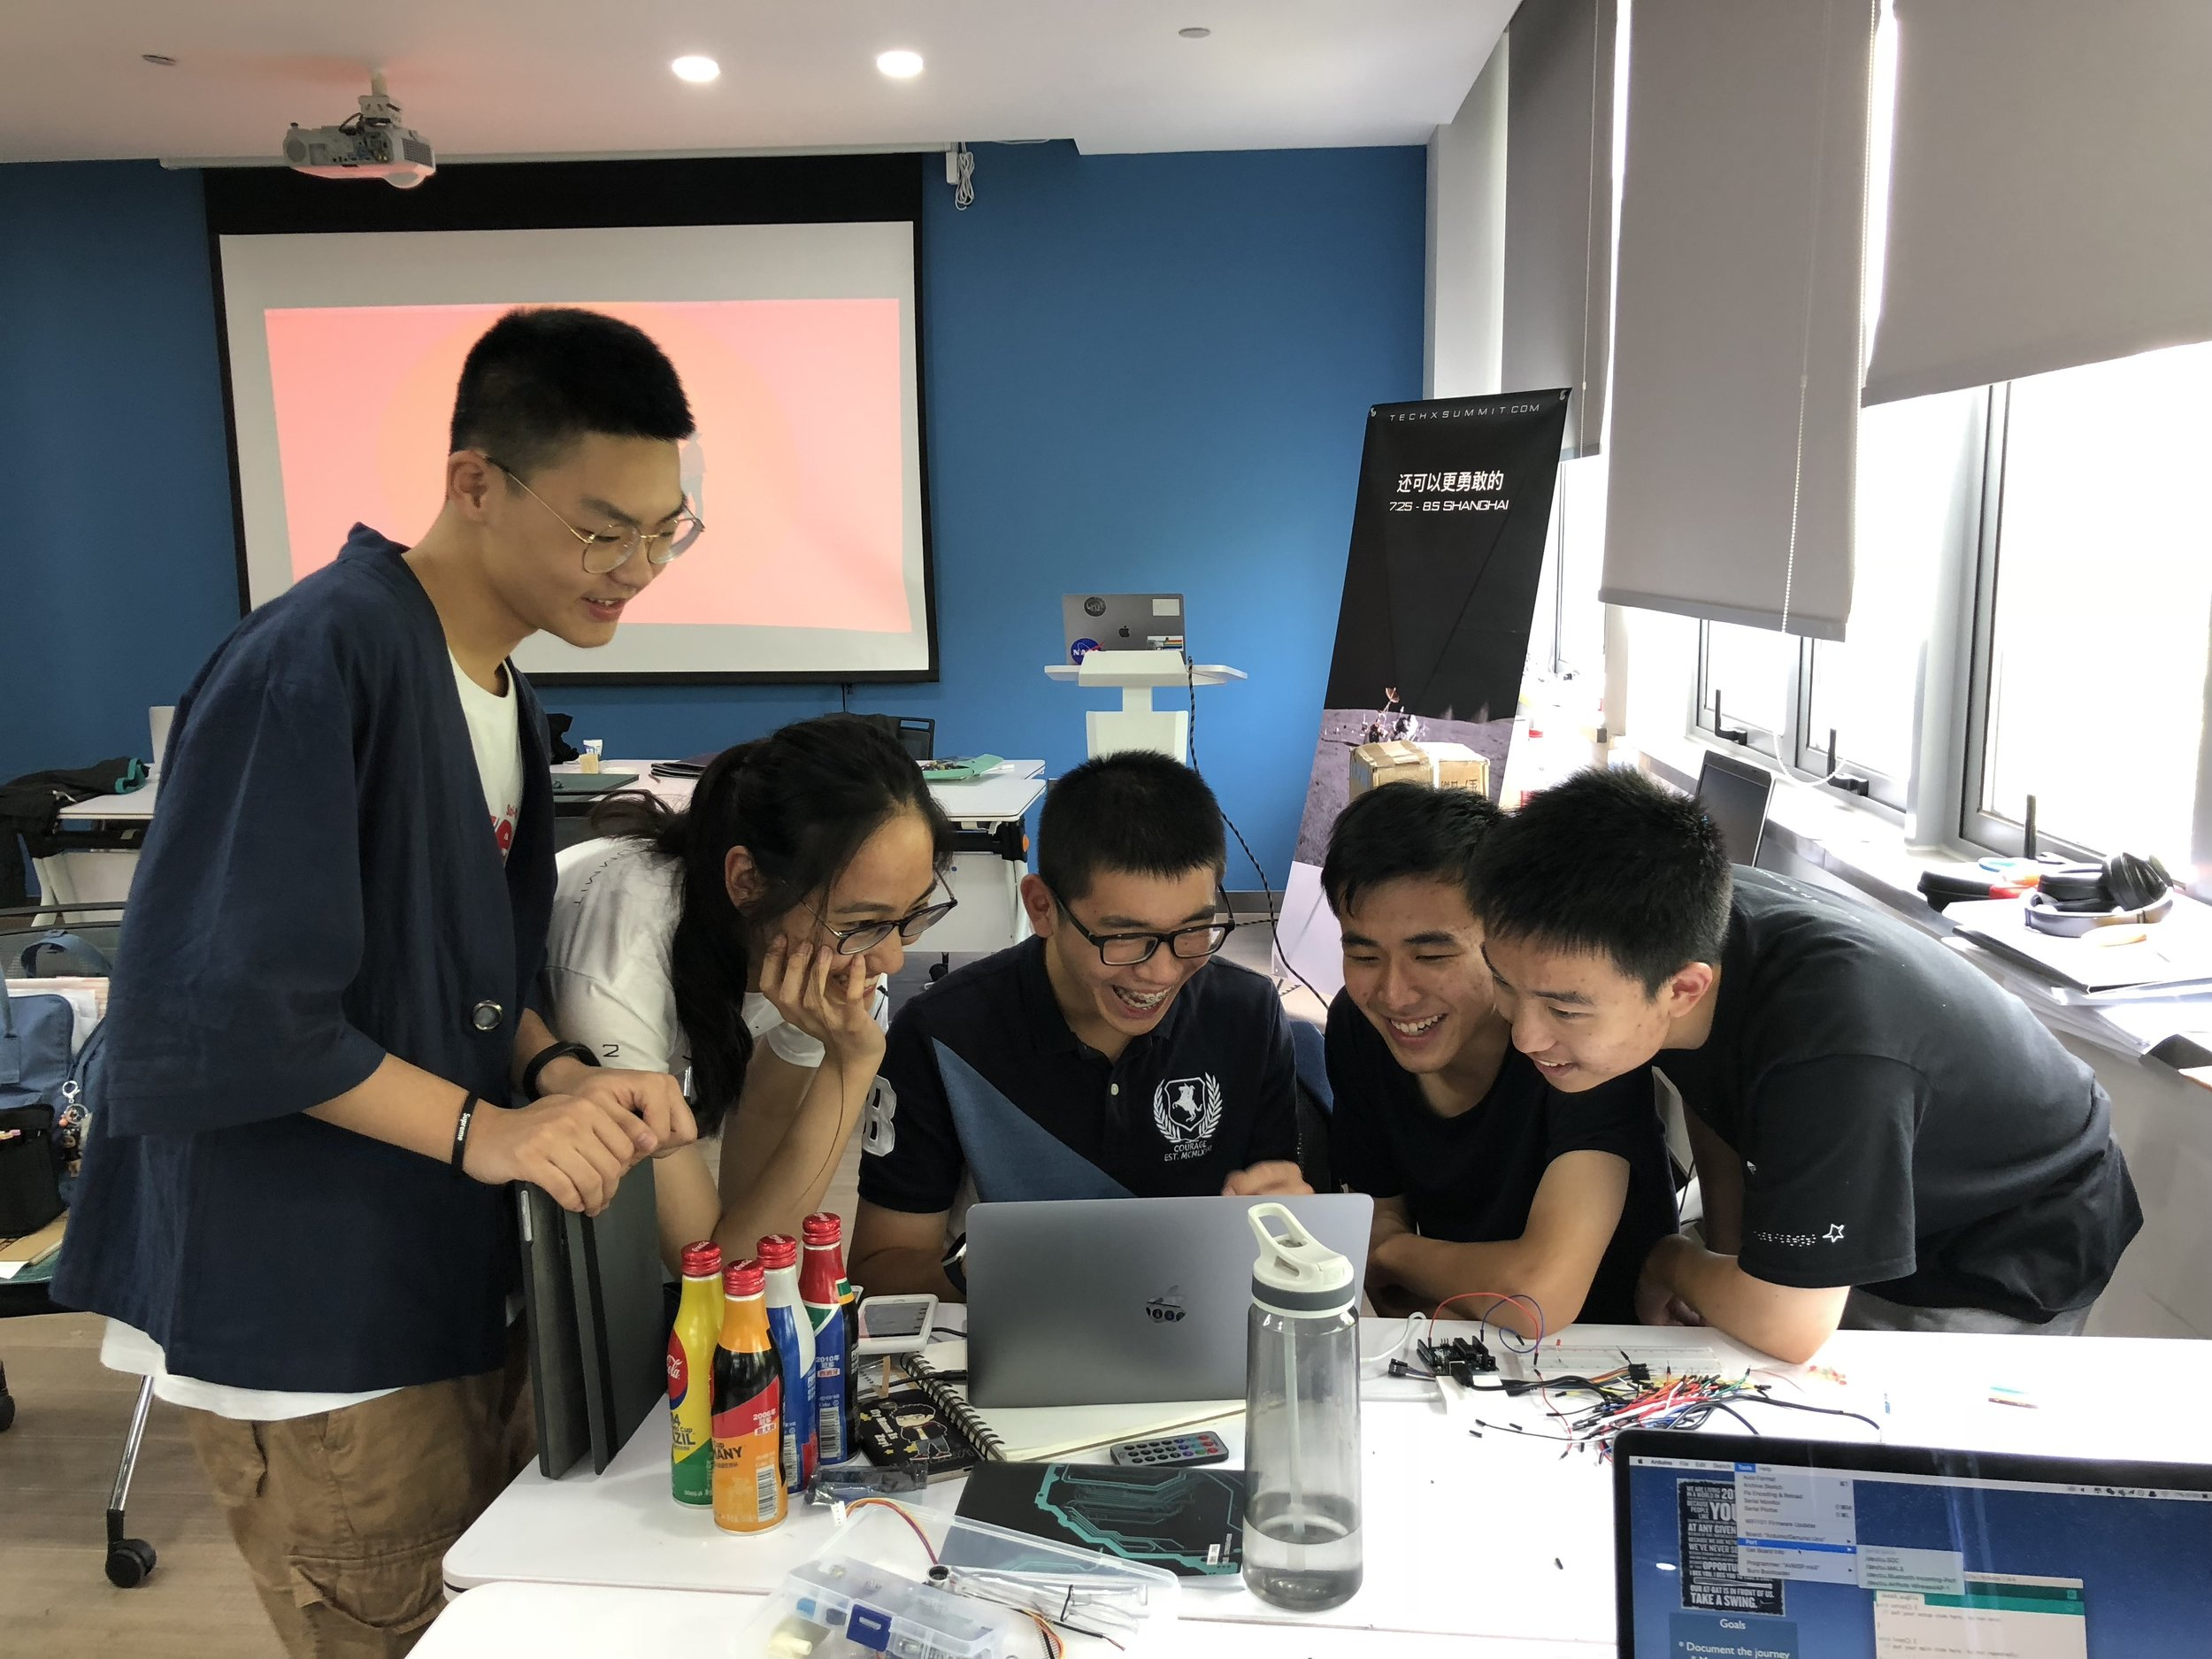 Arduino peer-teaching